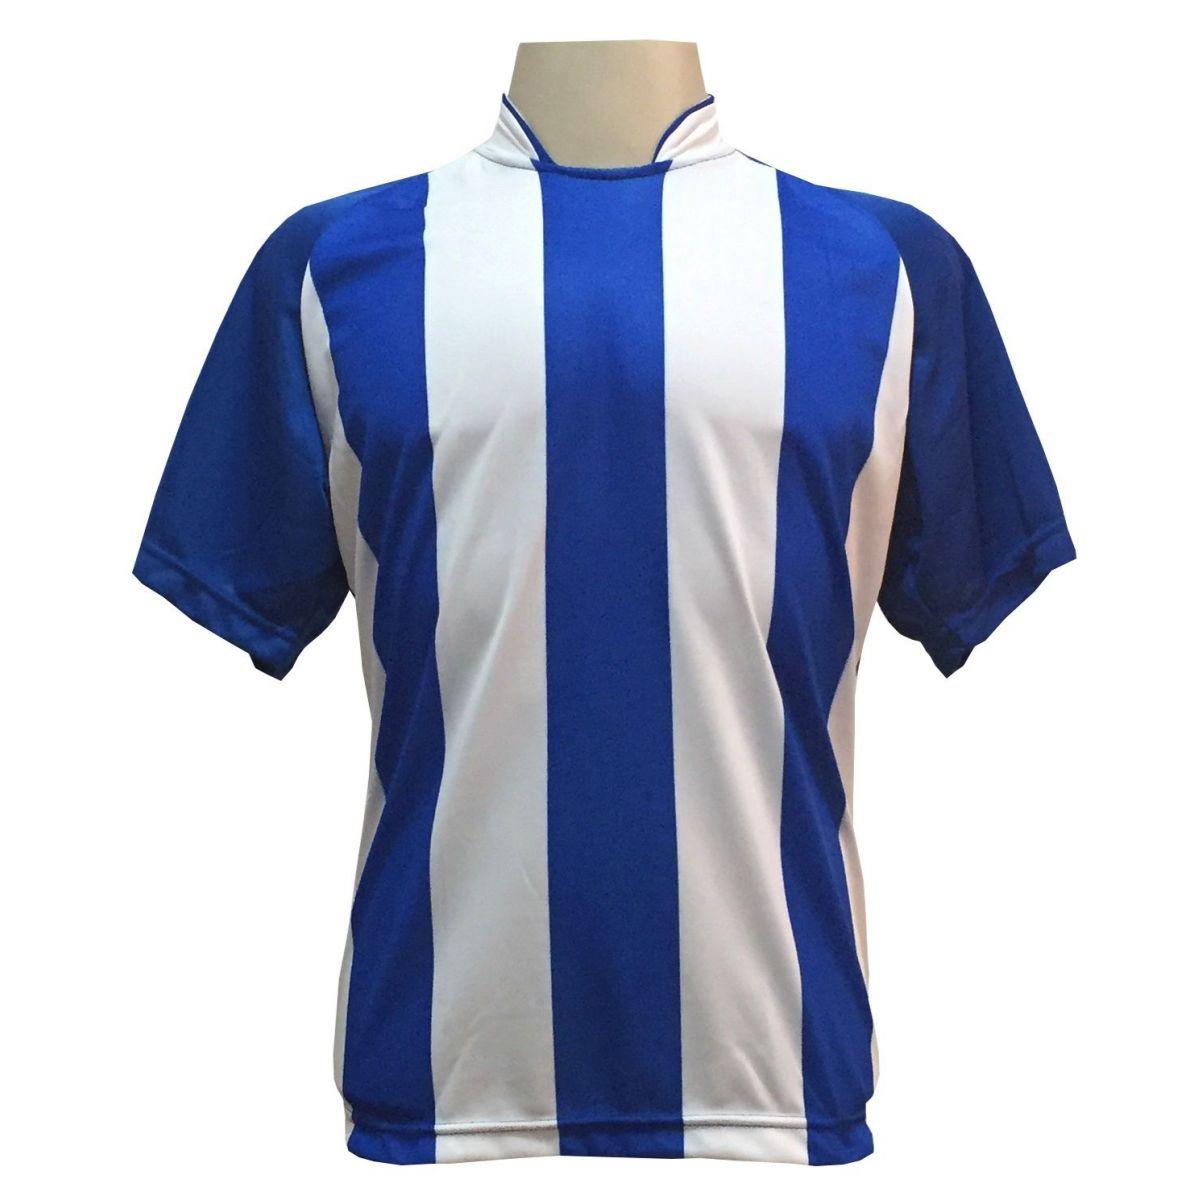 Uniforme Completo modelo Milan 18+1 (18 Camisas Royal/Branco + 18 Calções Copa Royal/Branco + 18 Pares de Meiões Royal + 1 Conjunto de Goleiro) + Brindes